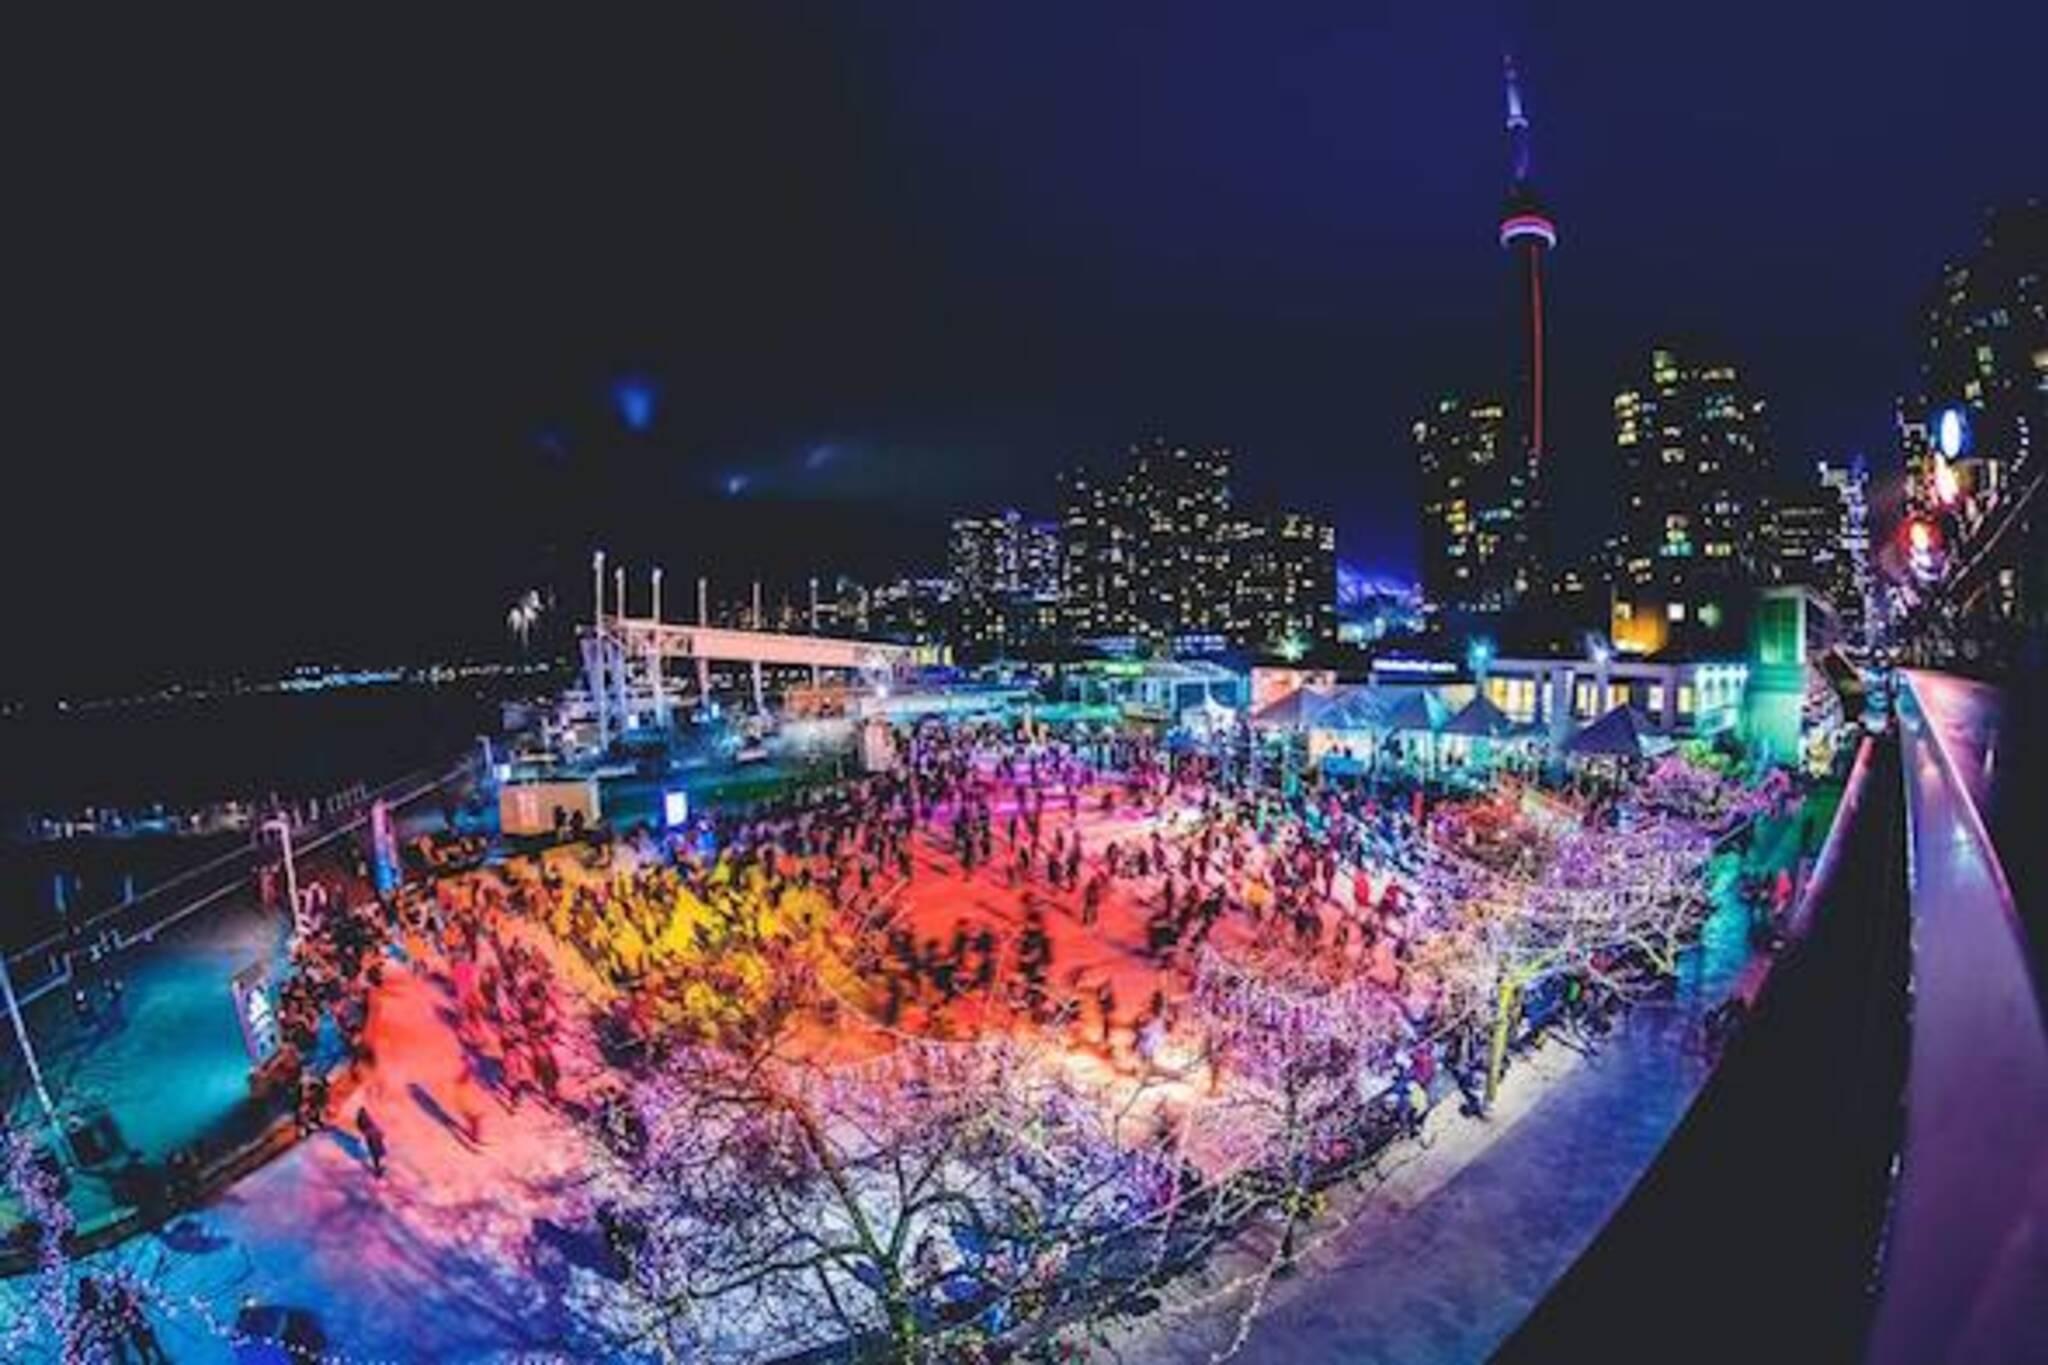 Free Dj Skate Nights Return To Toronto Next Month